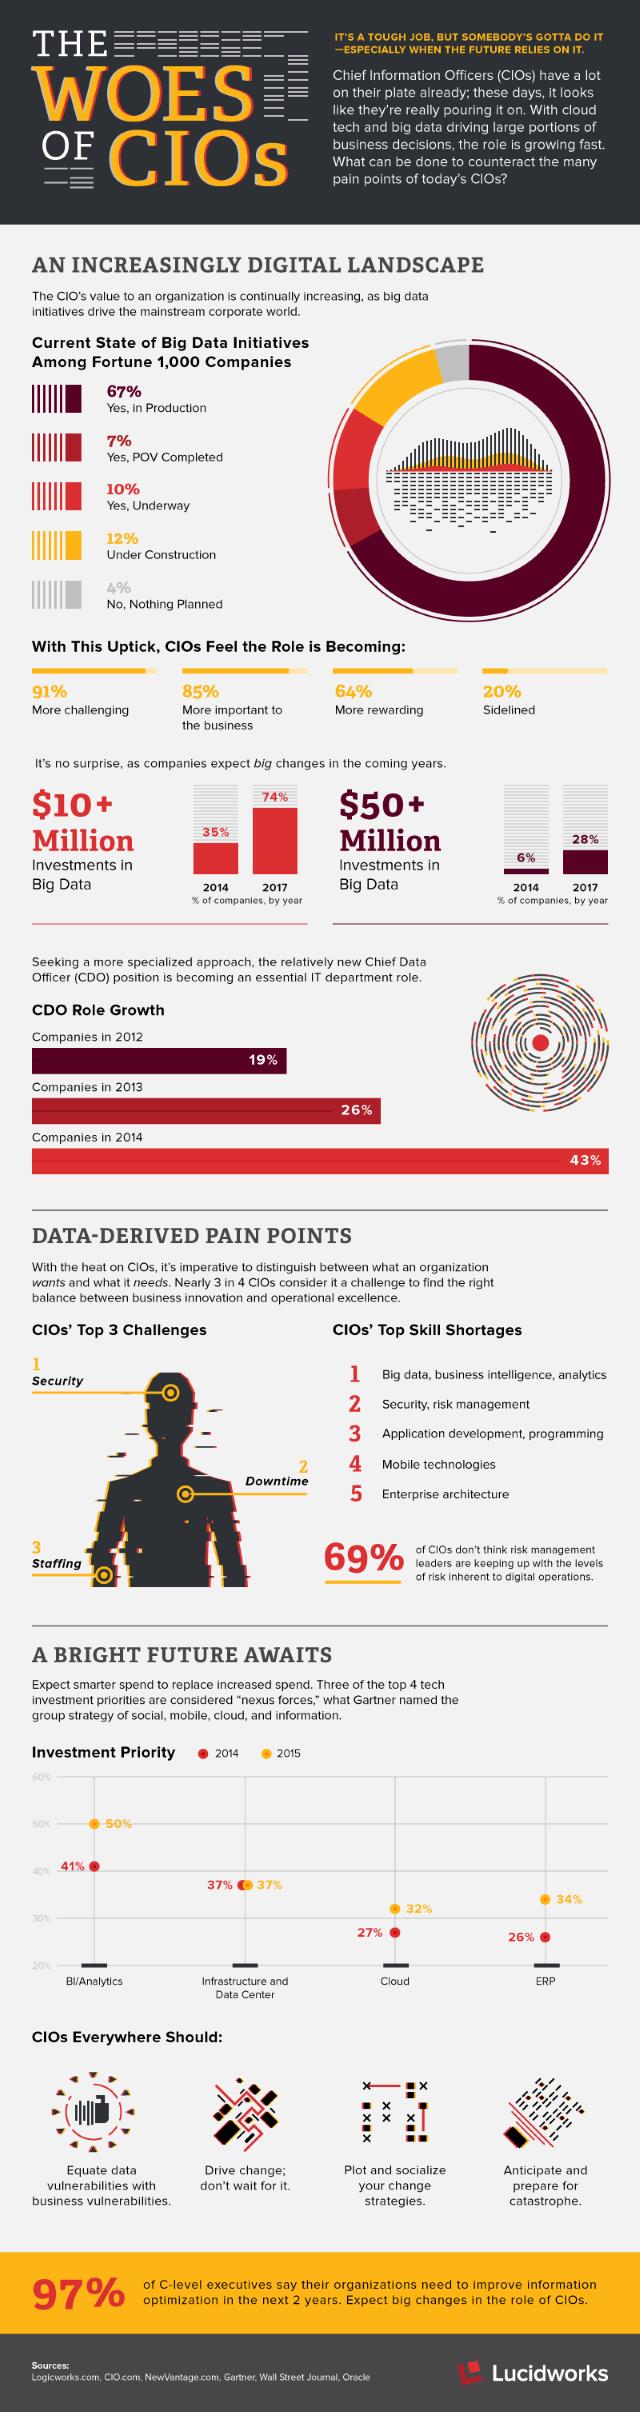 Lucidworks CIO infographic